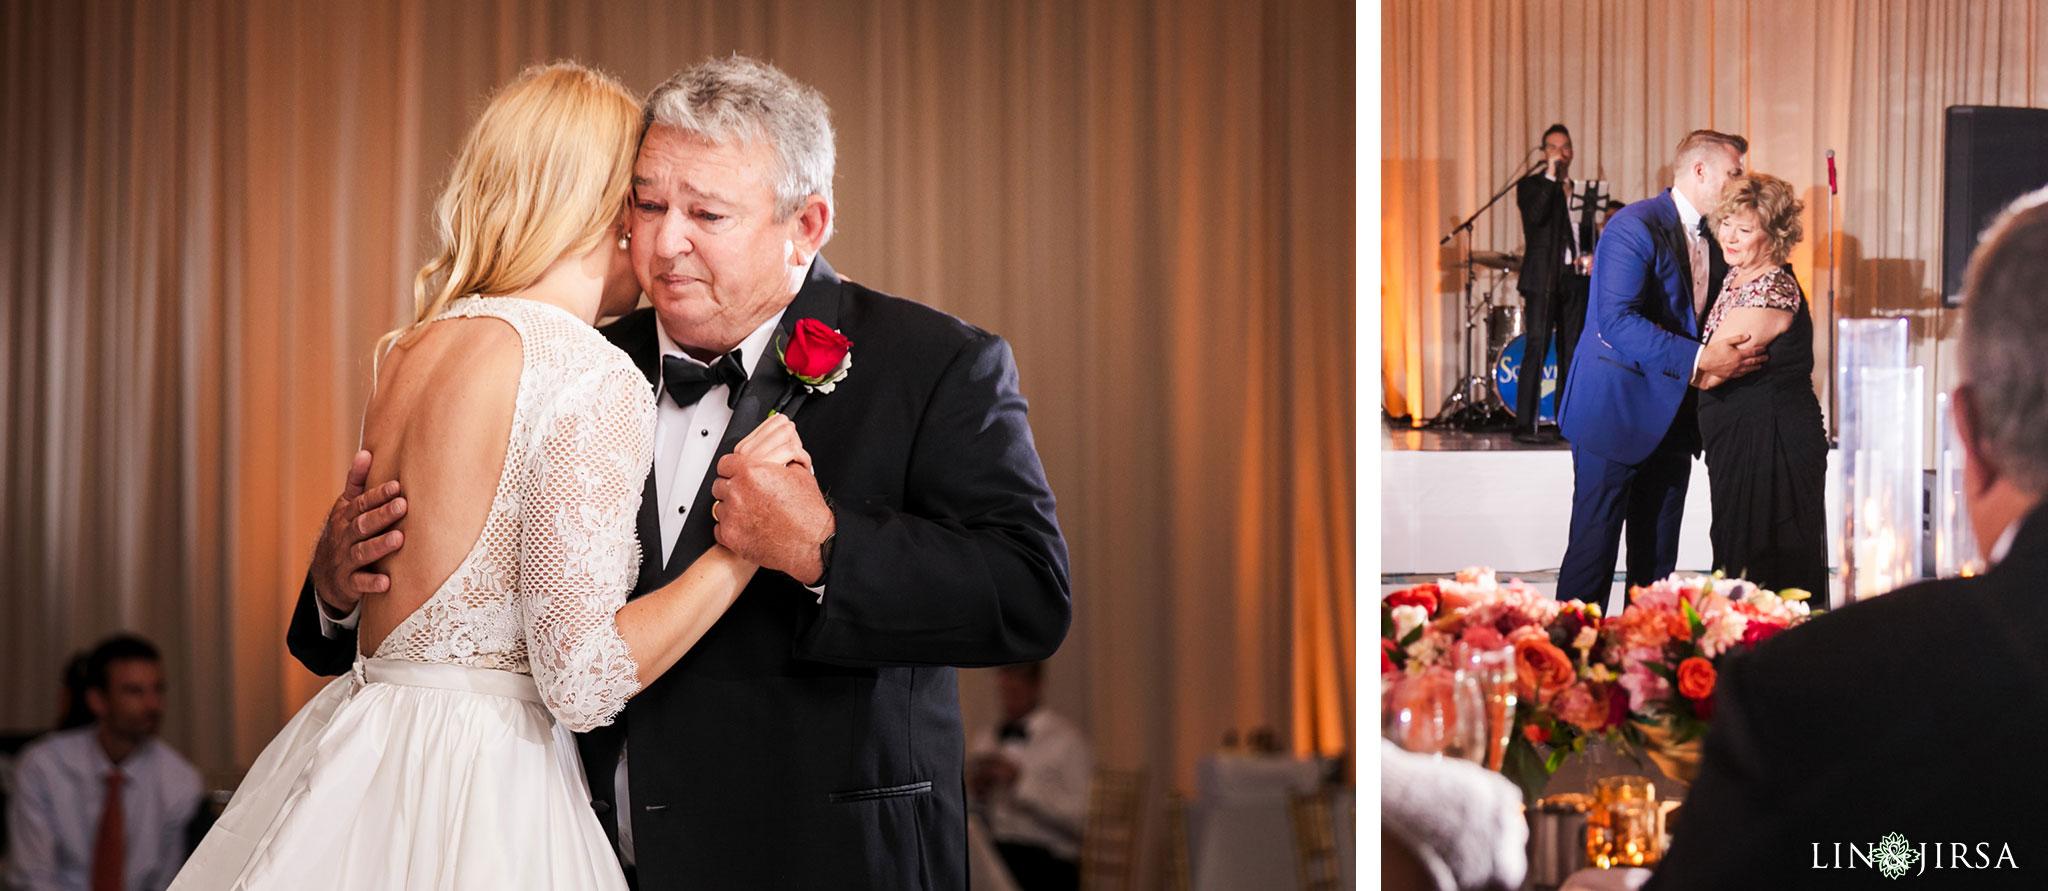 27 pasea hotel huntington beach wedding photography